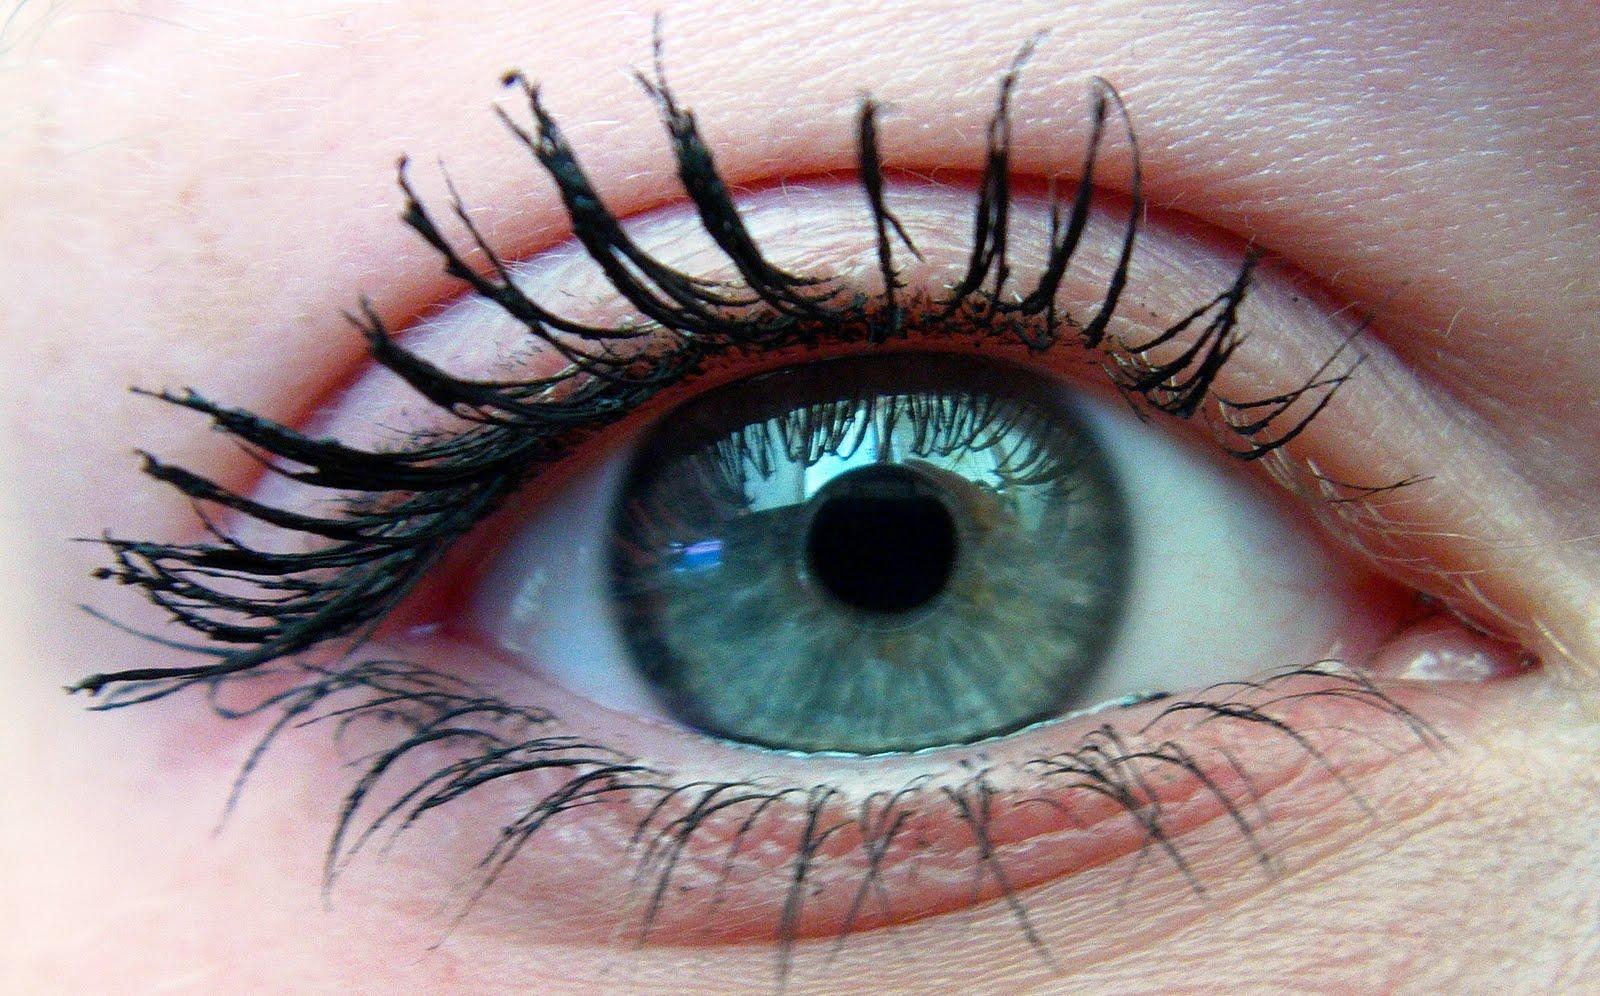 All Eyes On Me Mascara hd image